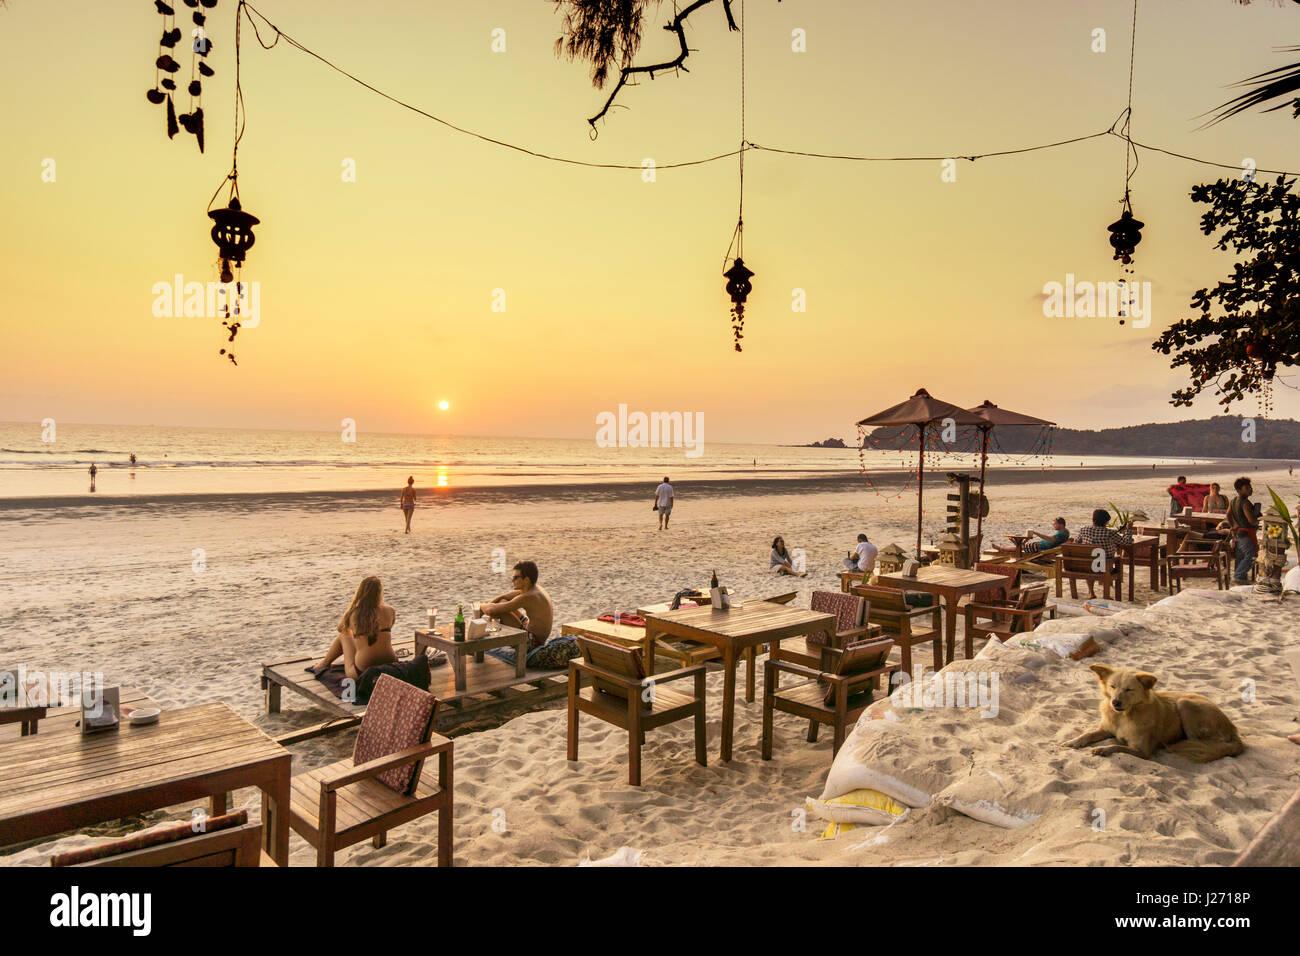 J.J. Seafood Restaurant, Long Beach, Ao Yai, sunset, Koh Phayam, Thailand - Stock Image